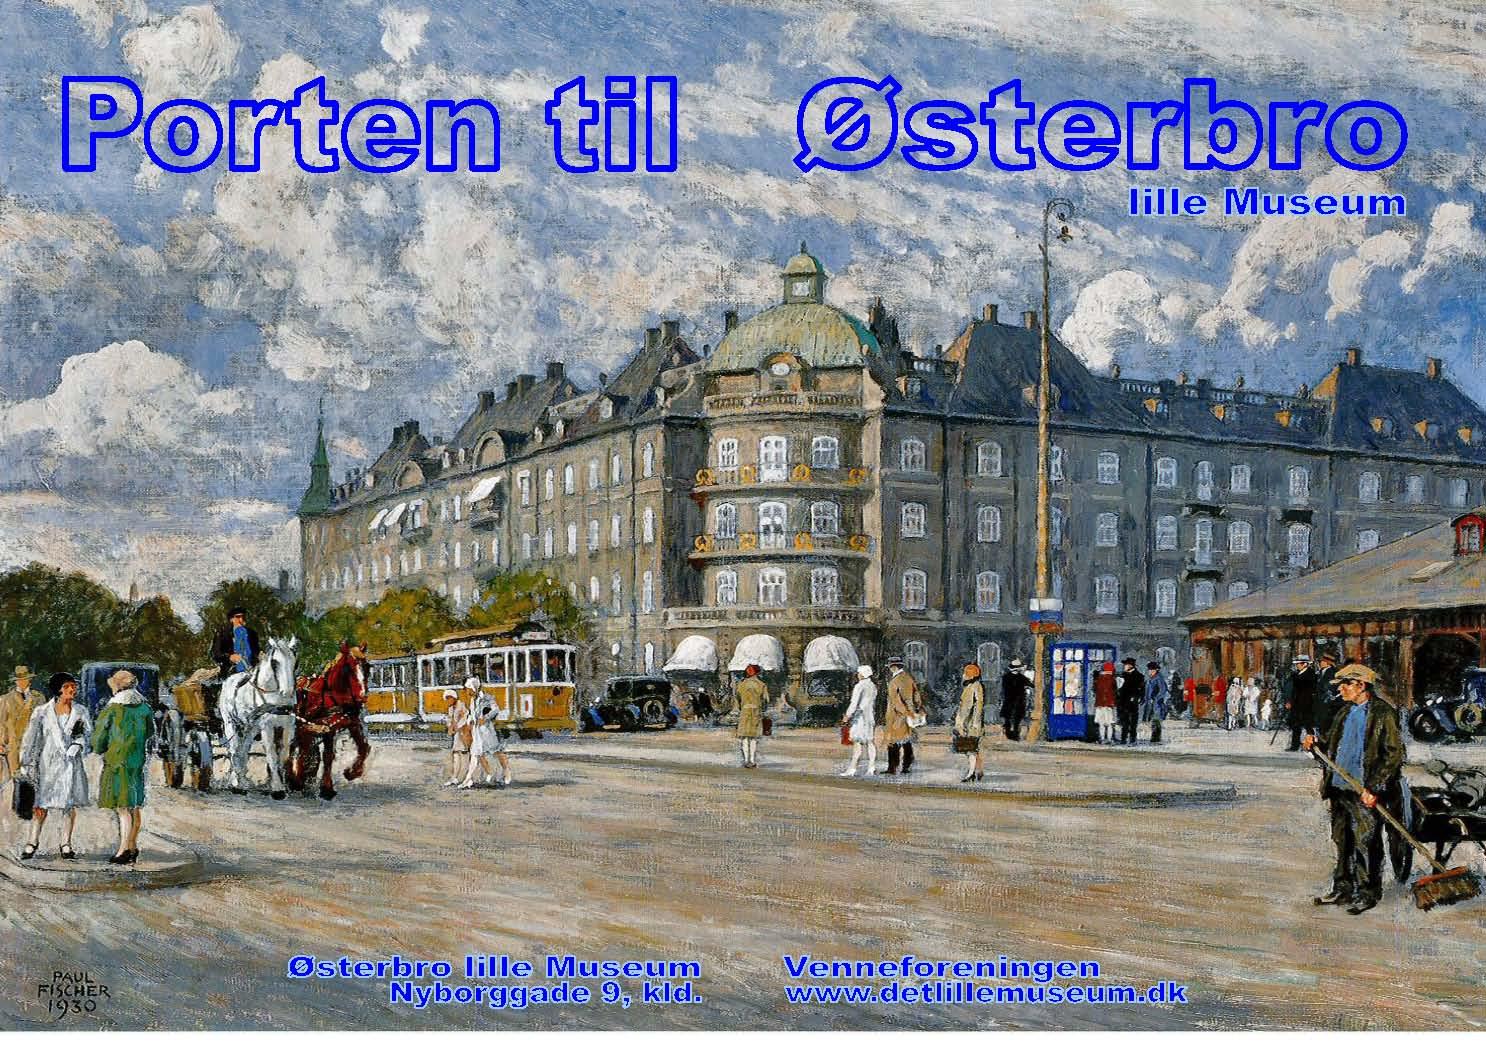 5/5 kl. 10.30 Østerbro Lille Museum @ Nabo Østerbro